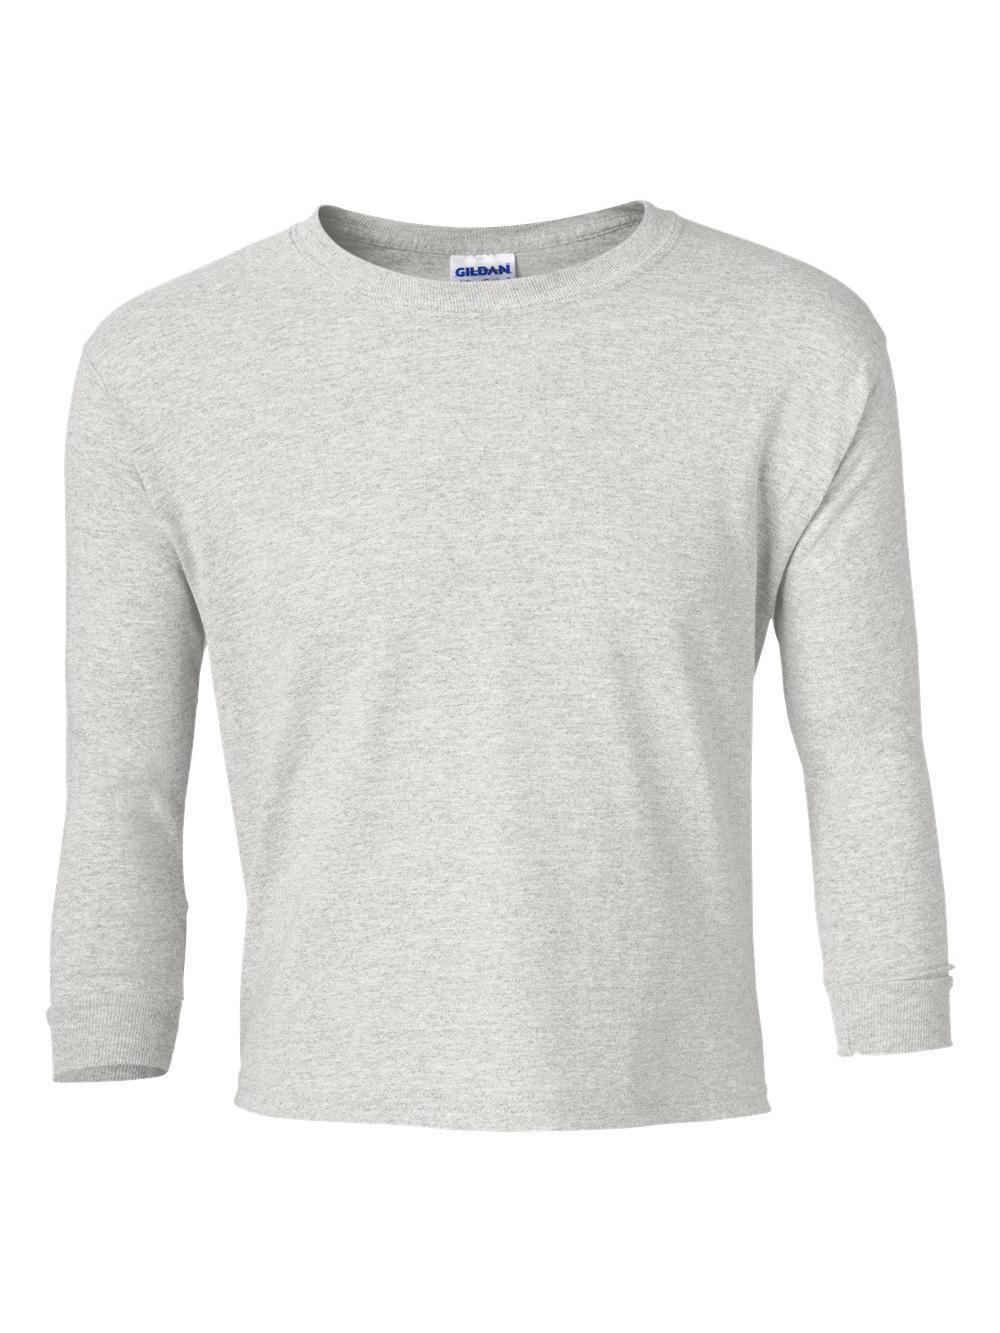 Ultra Cotton Youth Long Sleeve T-Shirt 2400B Gildan